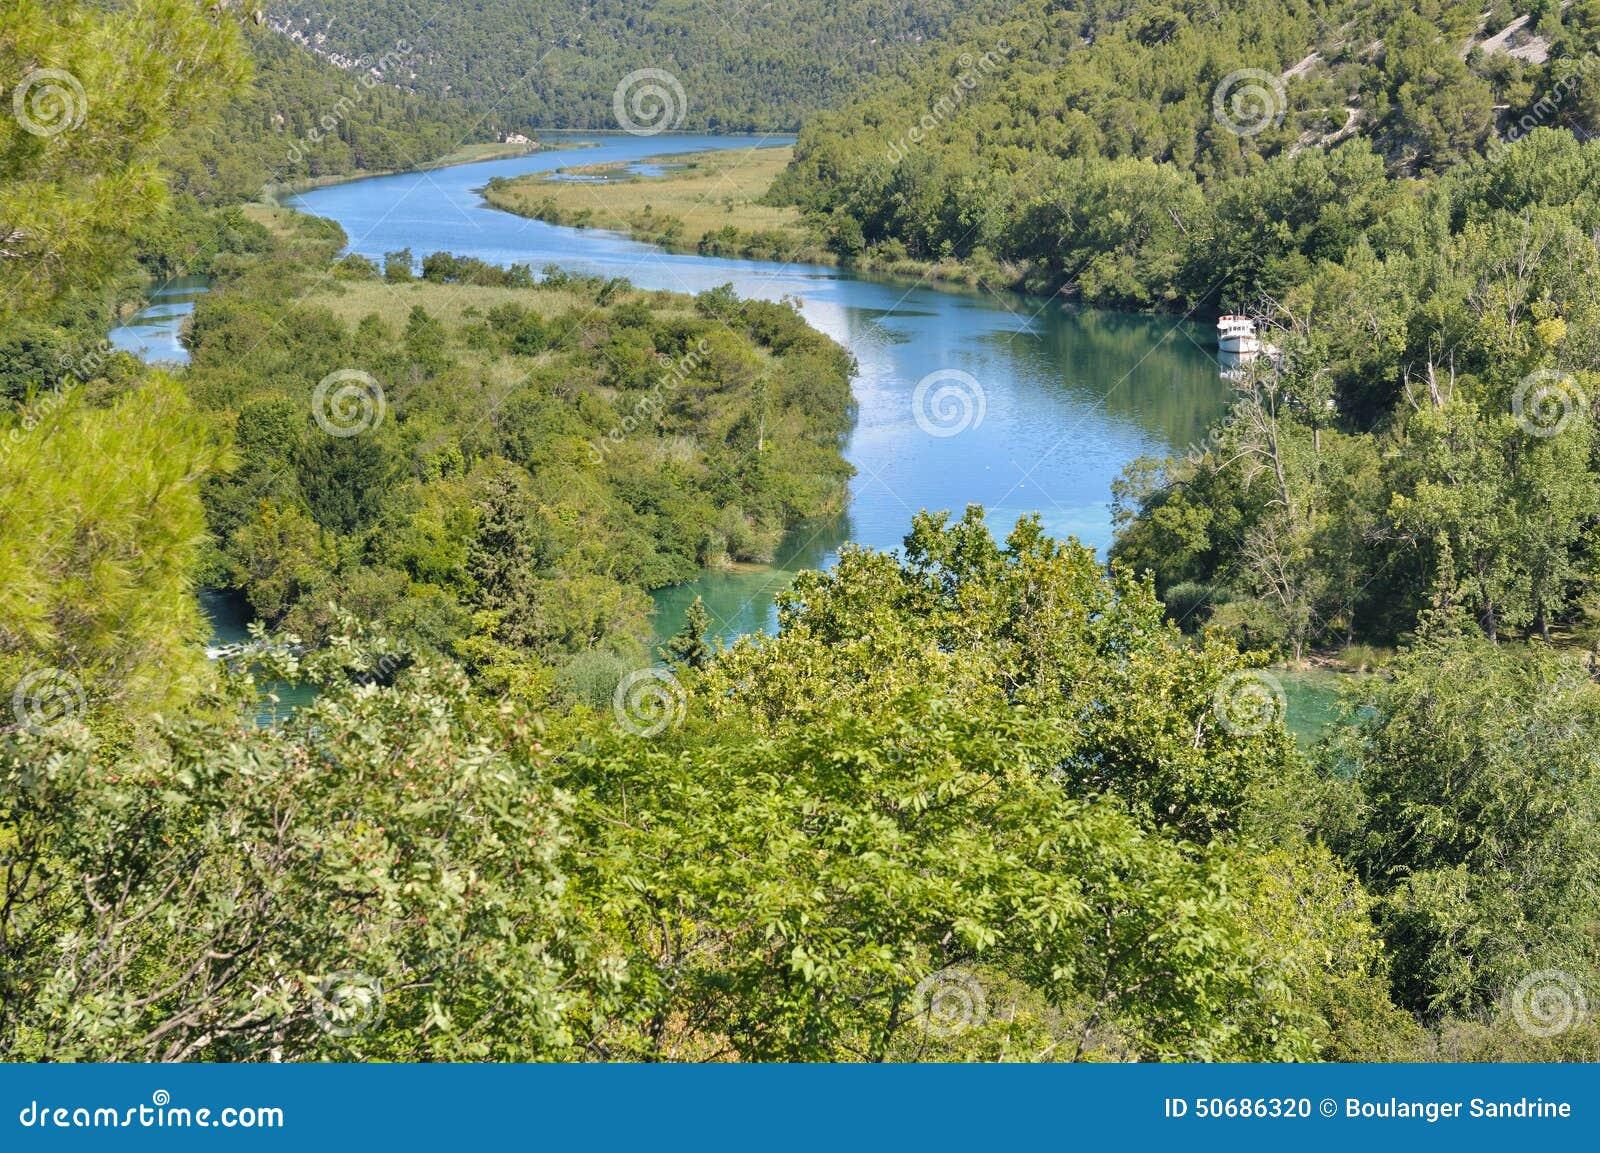 Download 公园在克罗地亚(Krka) 库存照片. 图片 包括有 旅行, 克罗地亚, 横向, 丰富, 旅游业, 植被 - 50686320